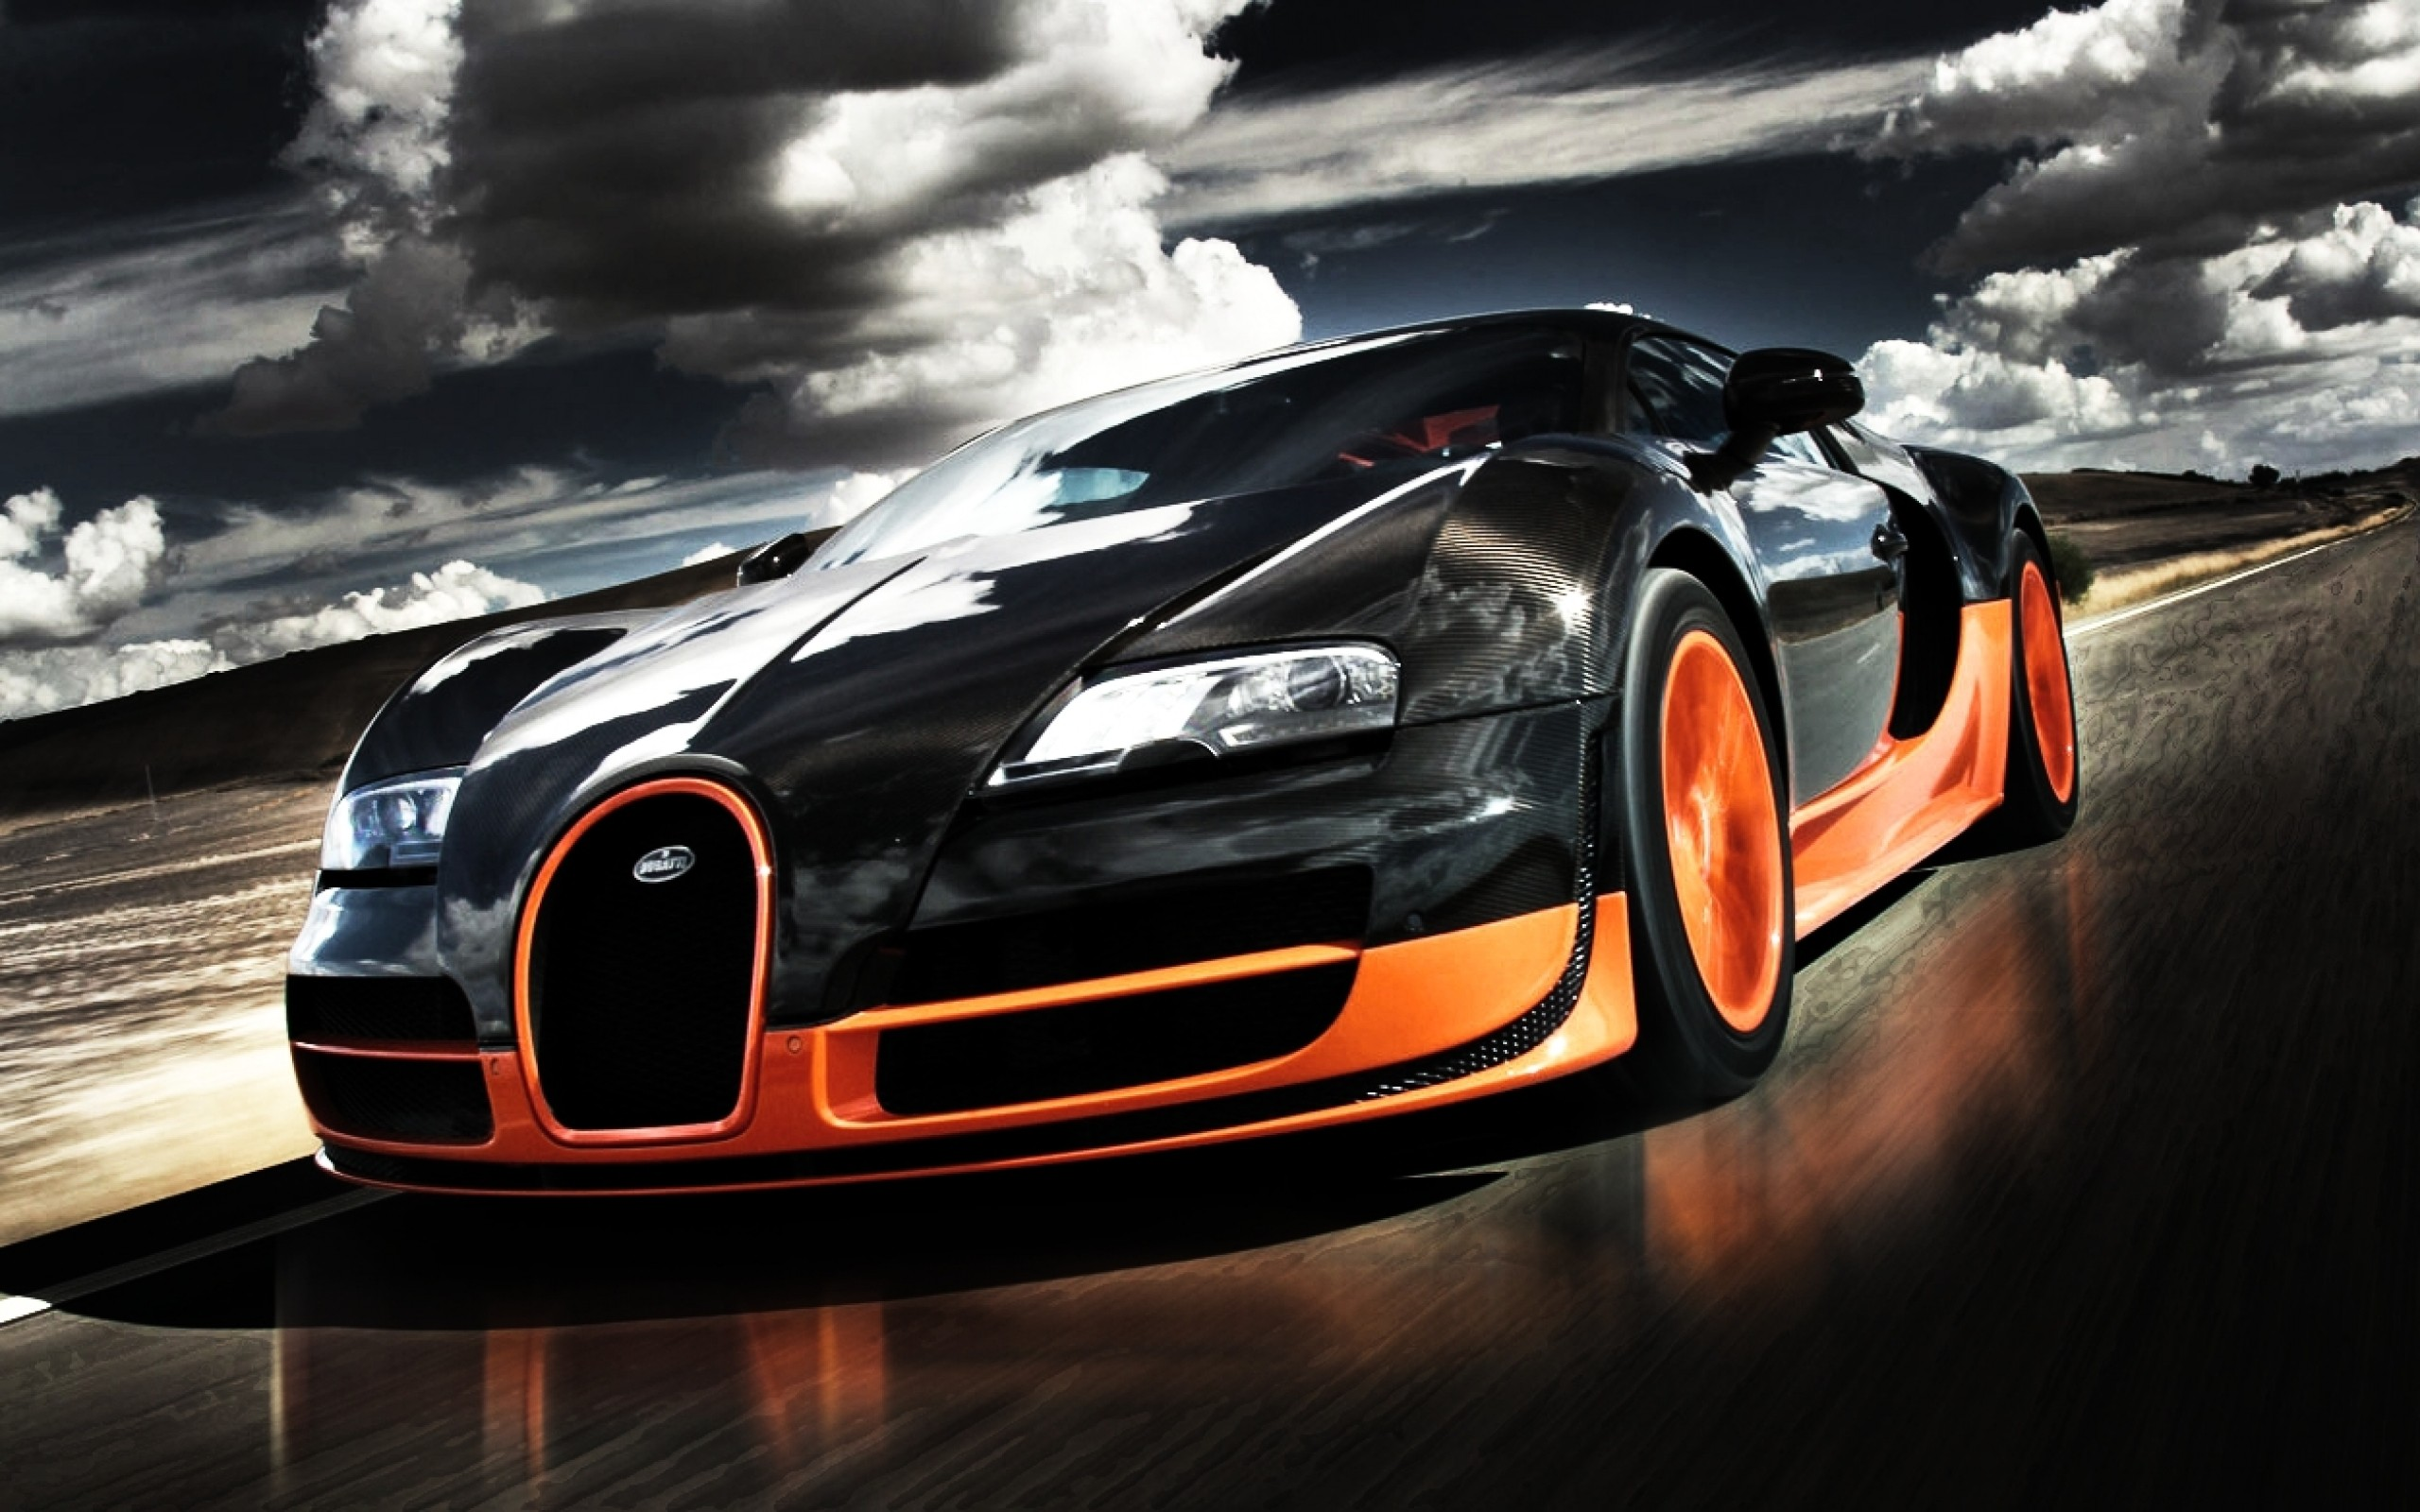 Bugatti Veyron дорога рассвет бесплатно